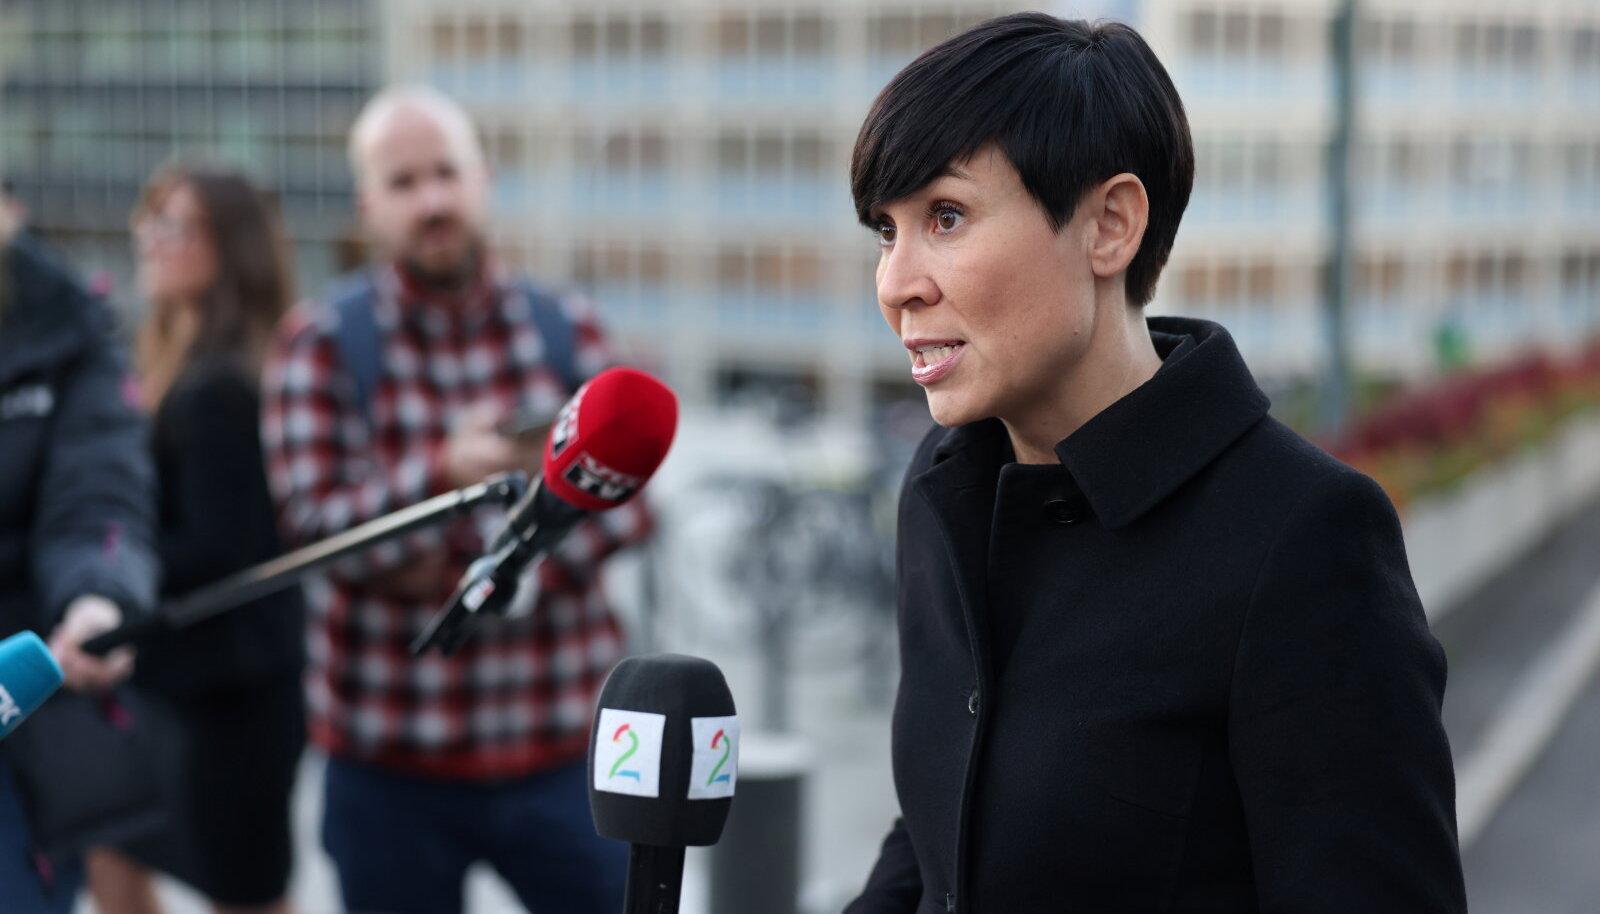 Norra välisminister Ine Eriksen Søreide kommenteerib juhtumit